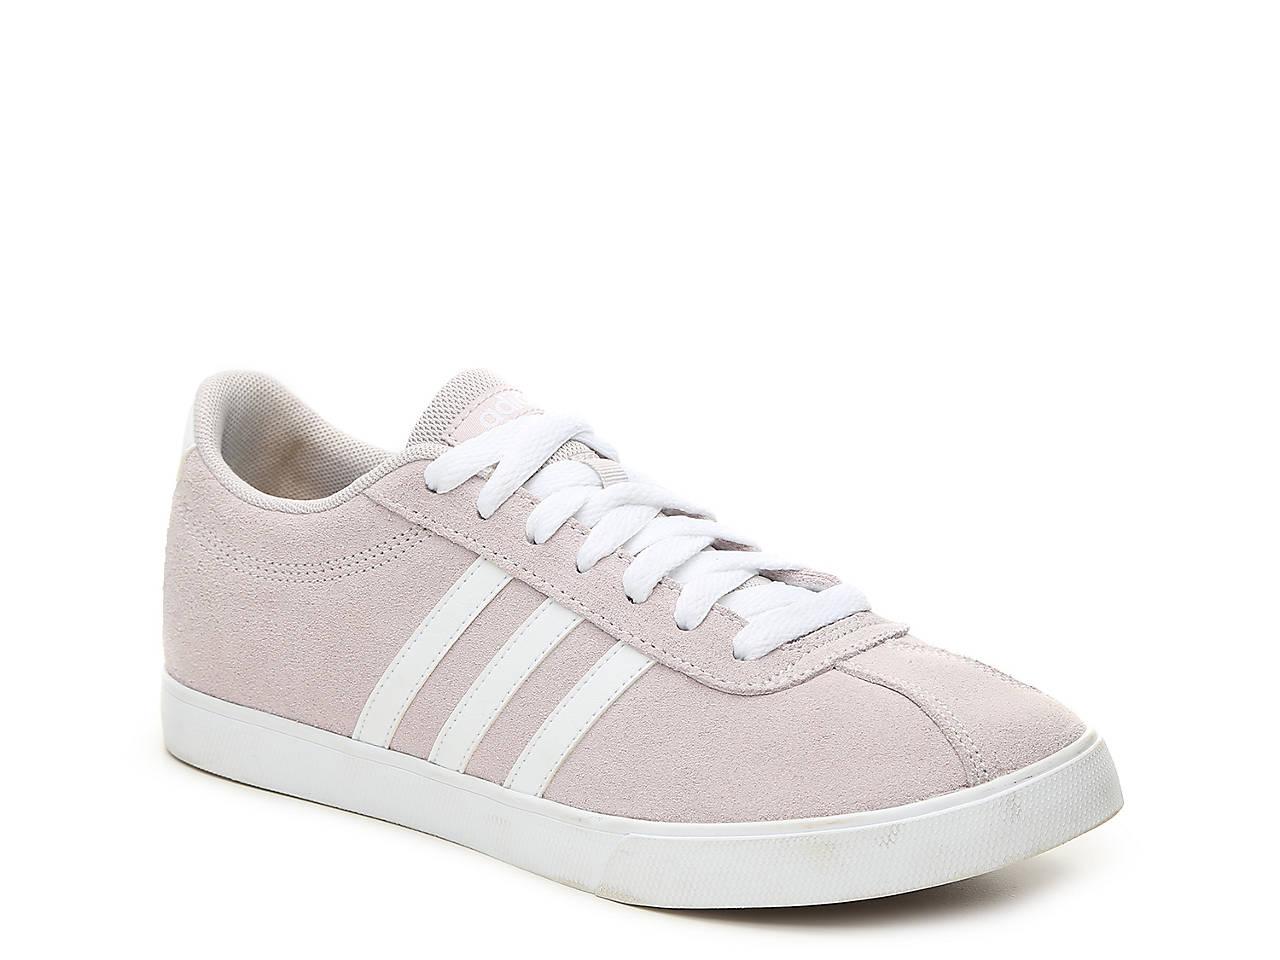 slip on adidas womens shoes